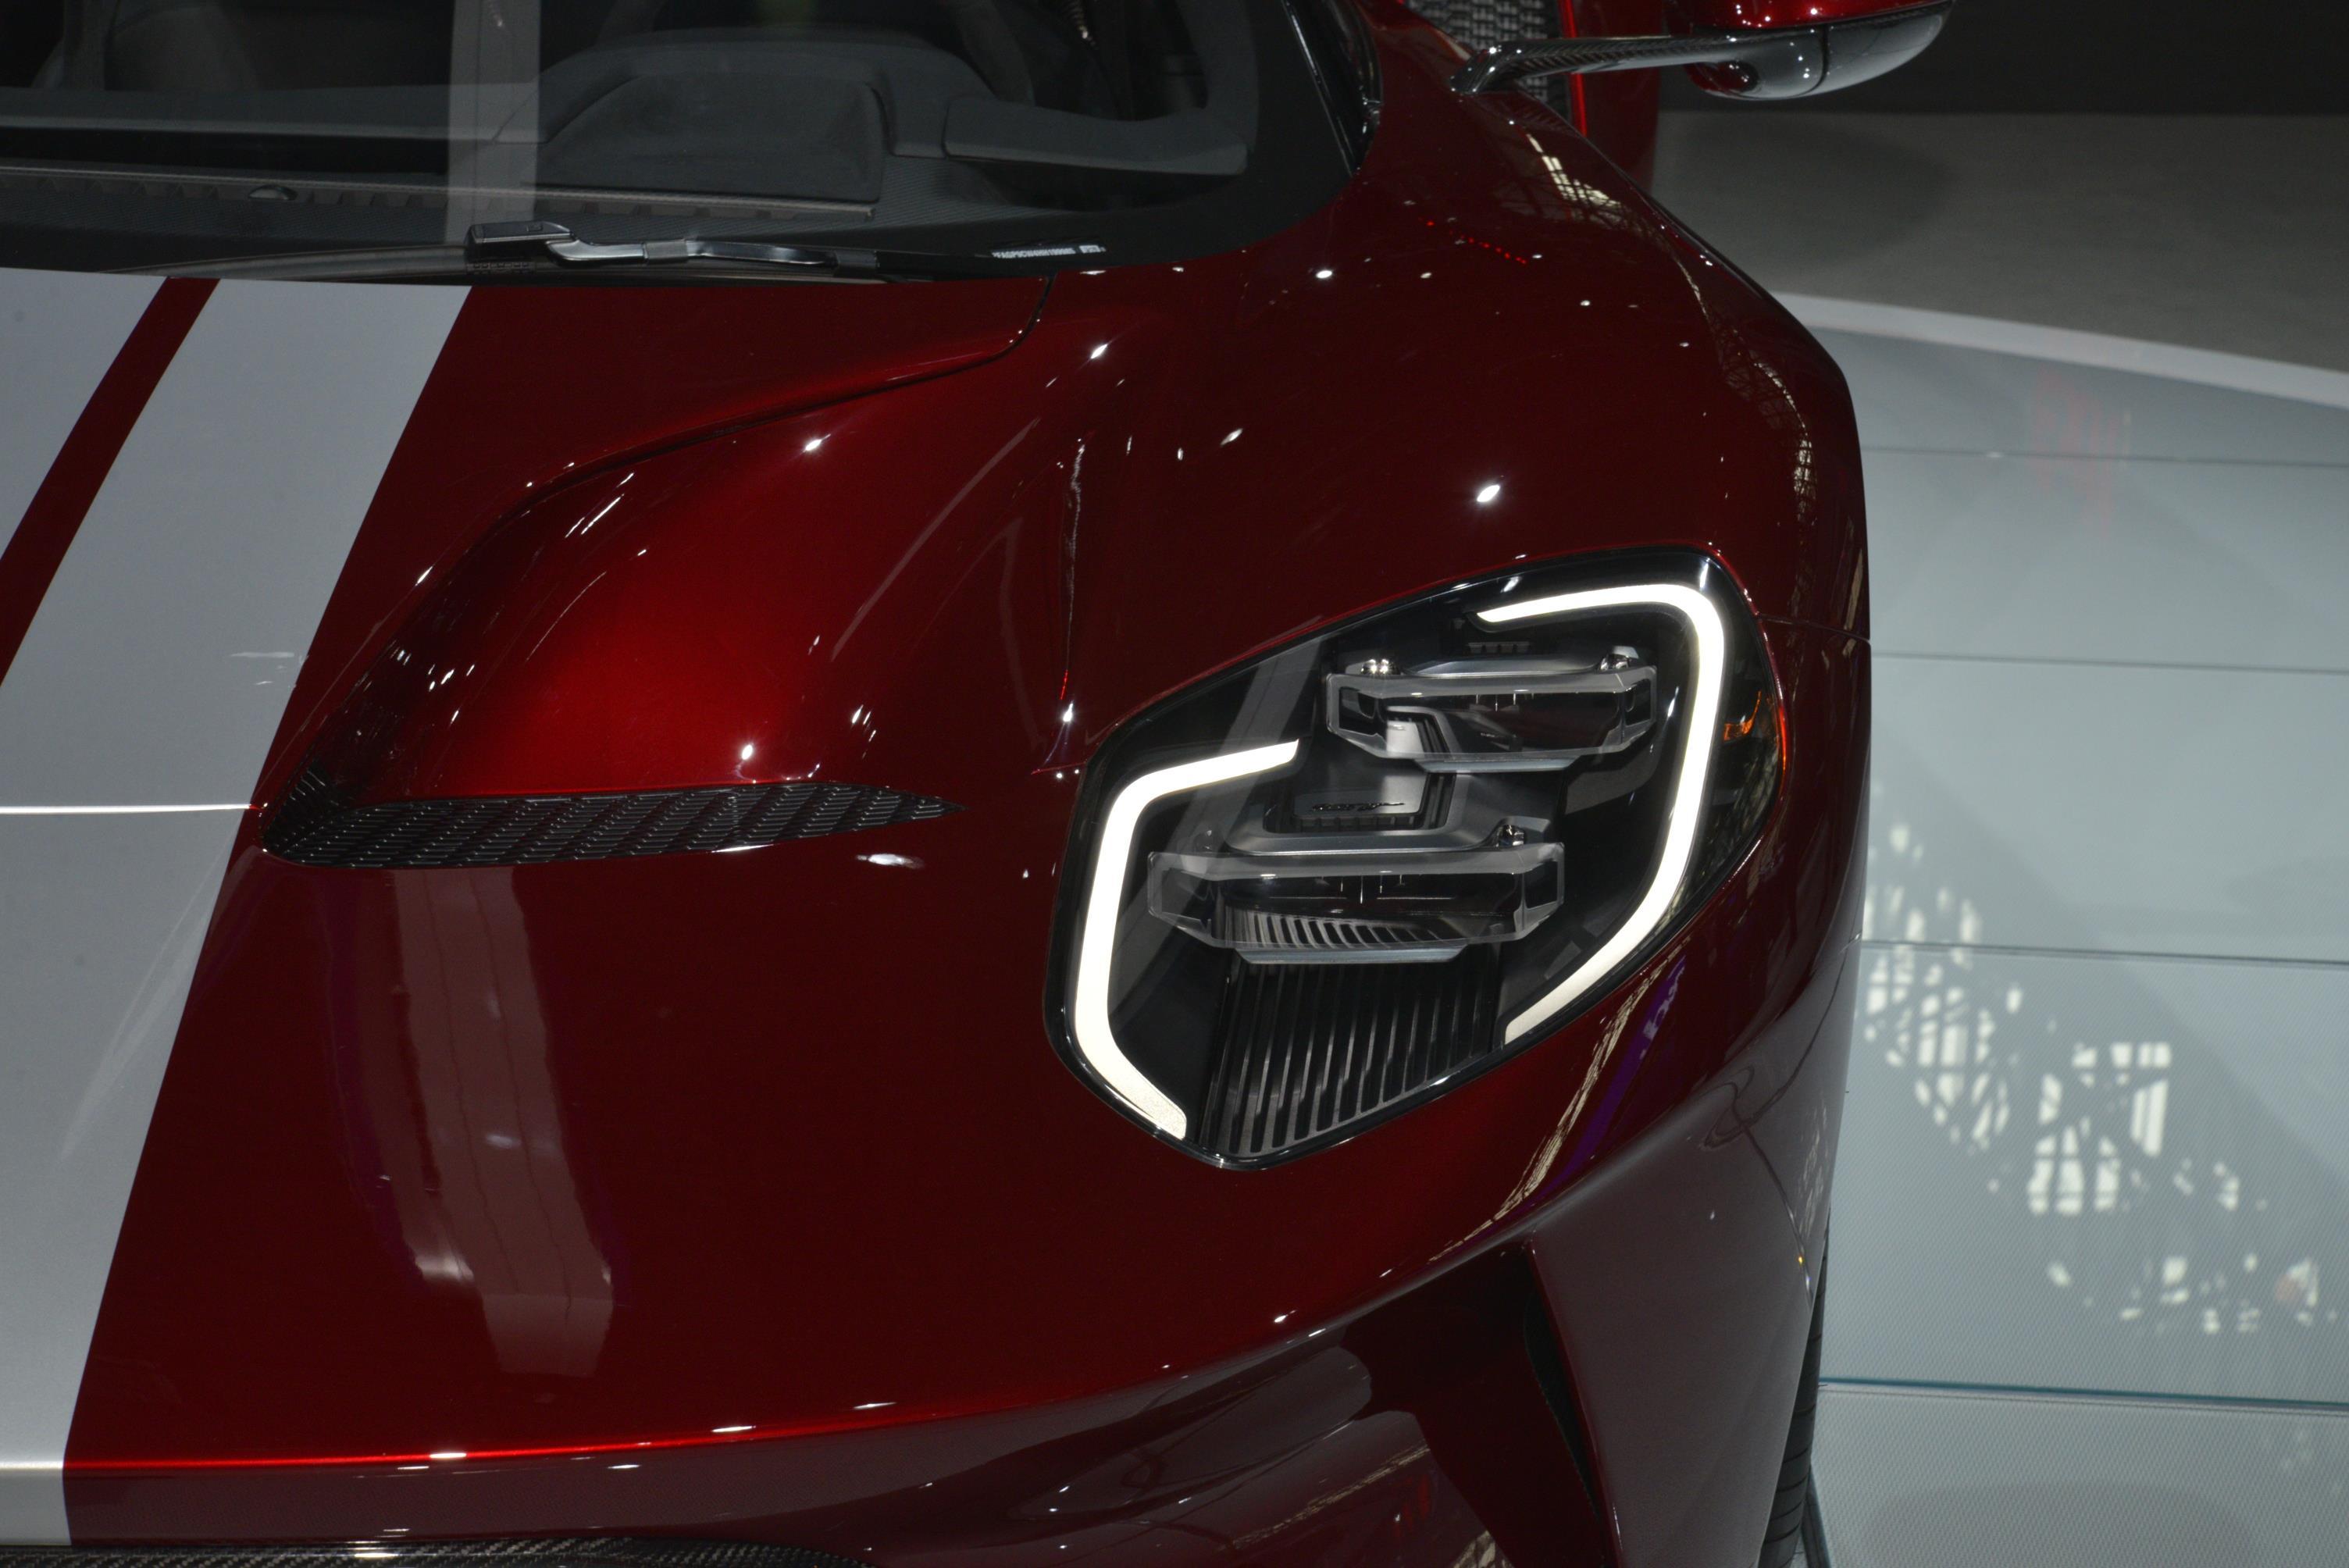 New York Auto Show 2017 (8)